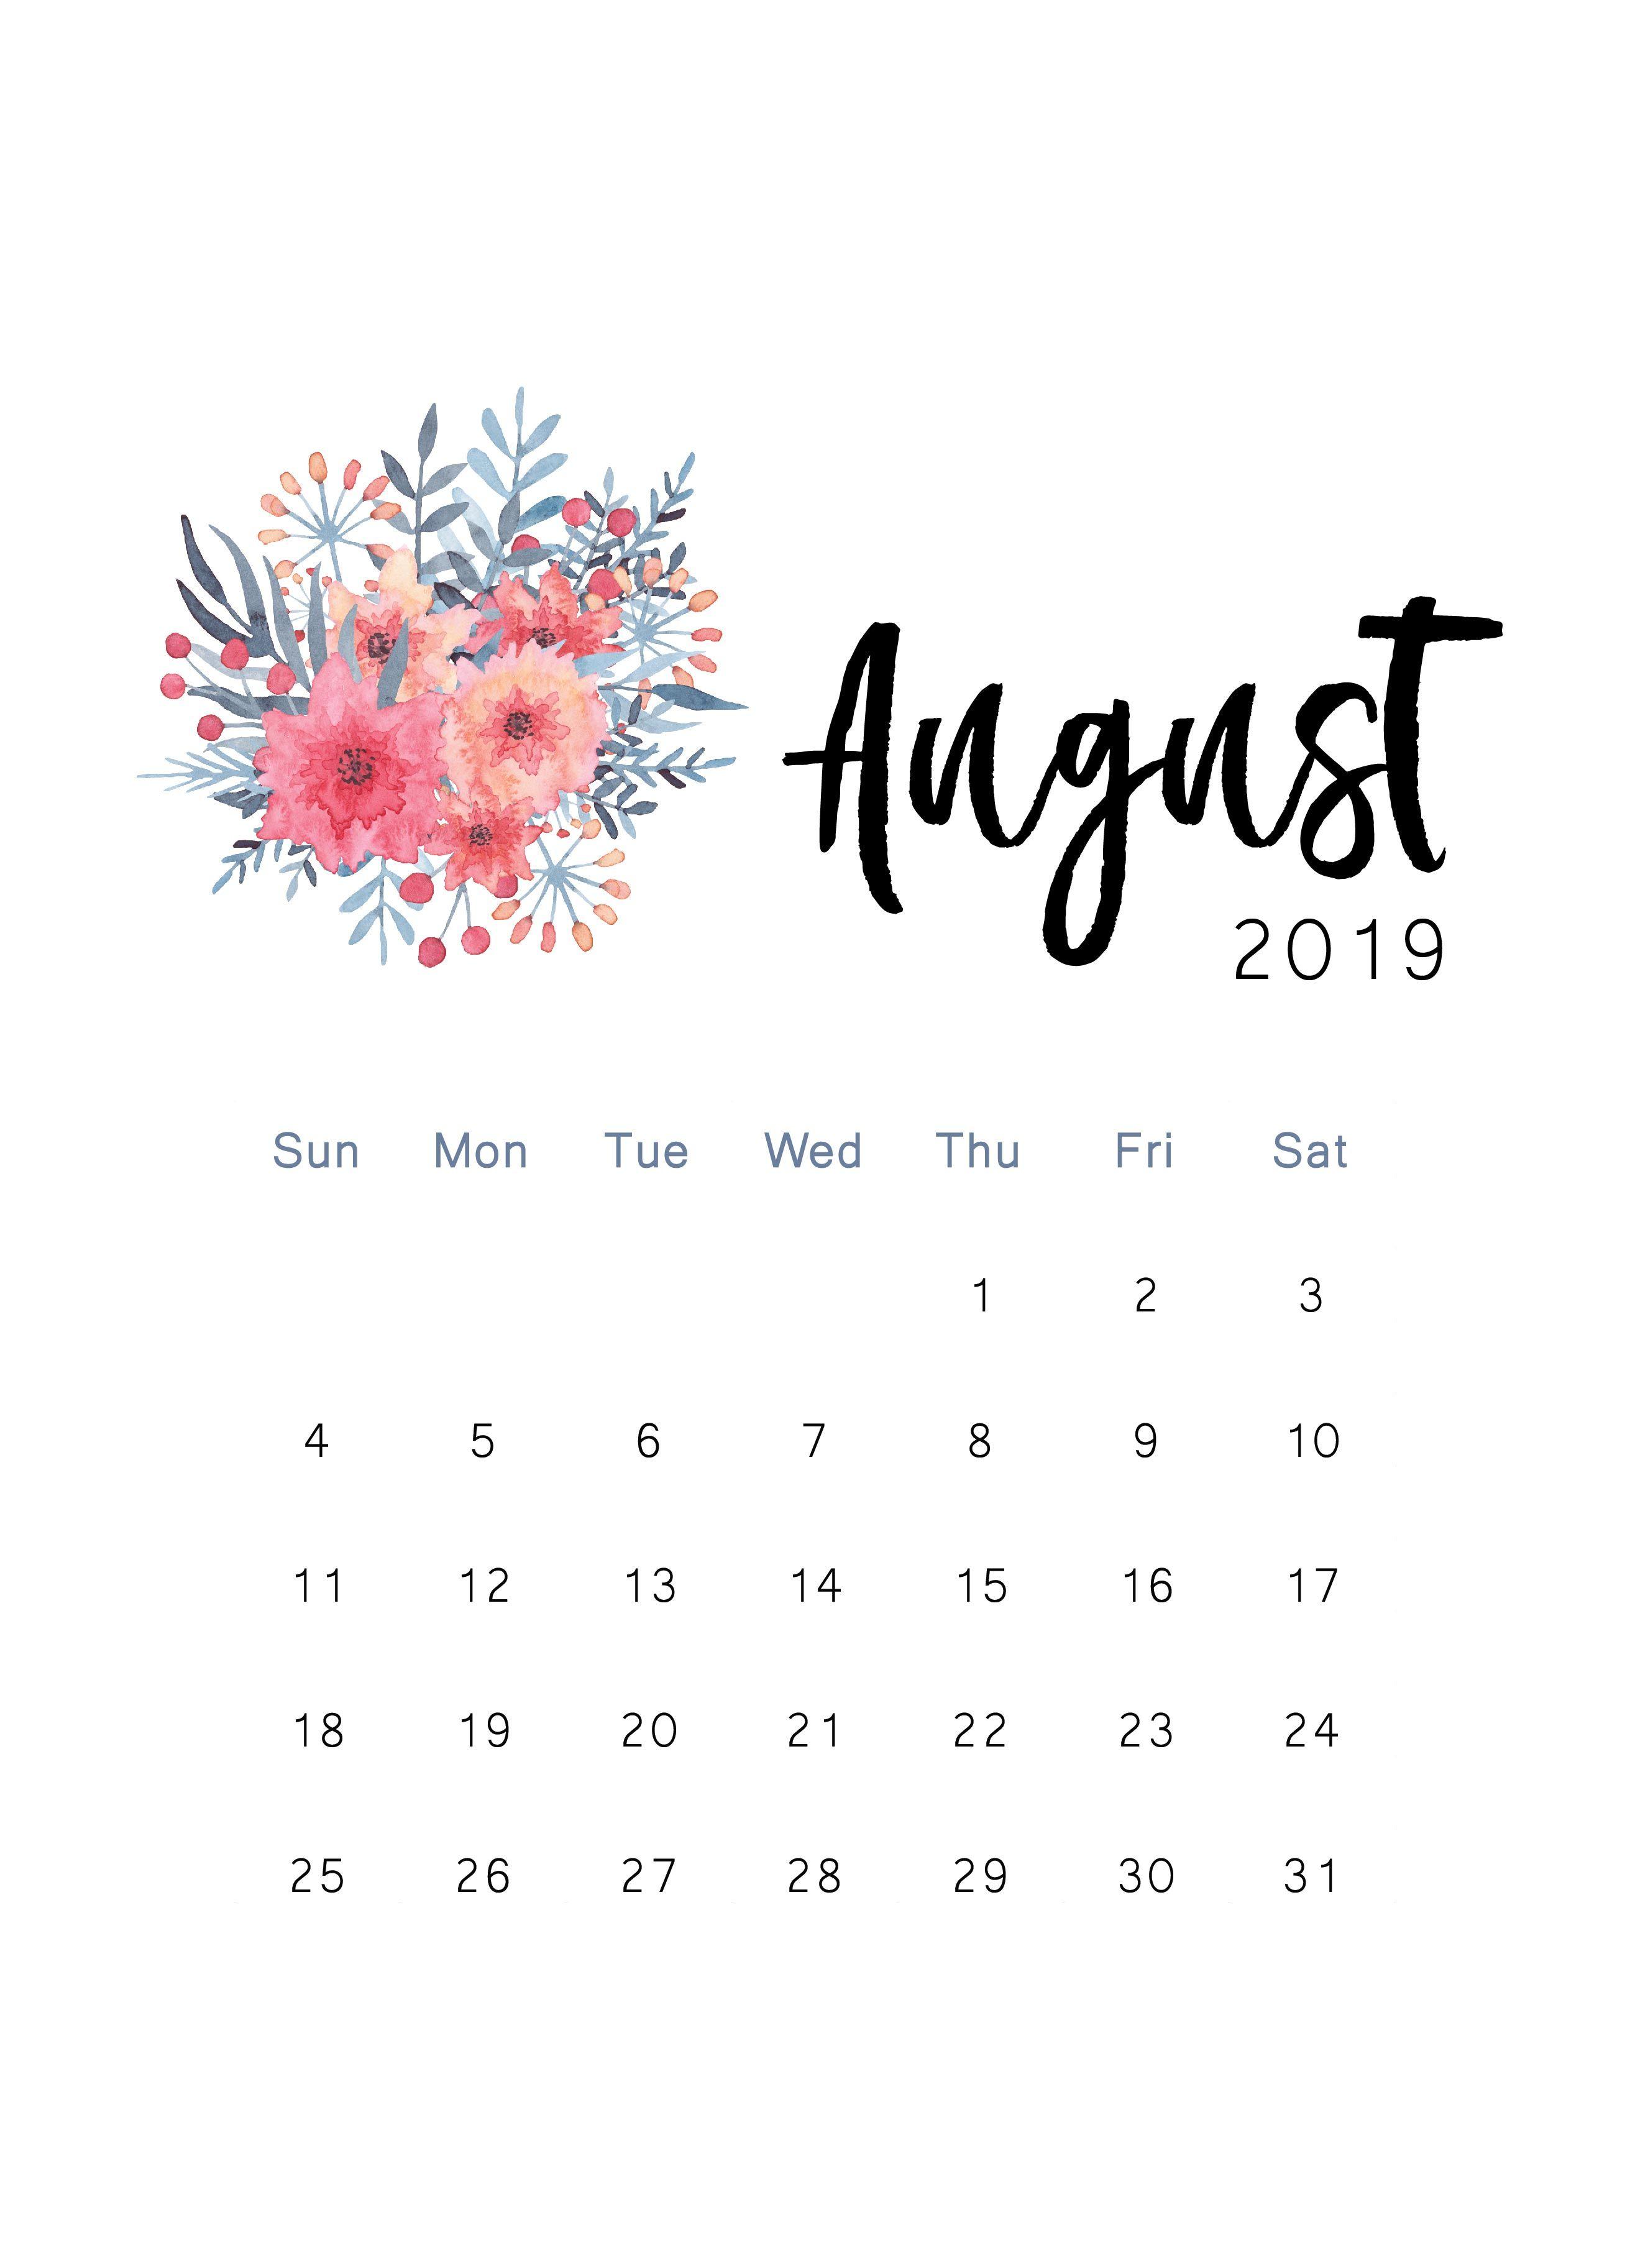 August 2019 Printable Calendar The Cactus Creative Print 2623x3649